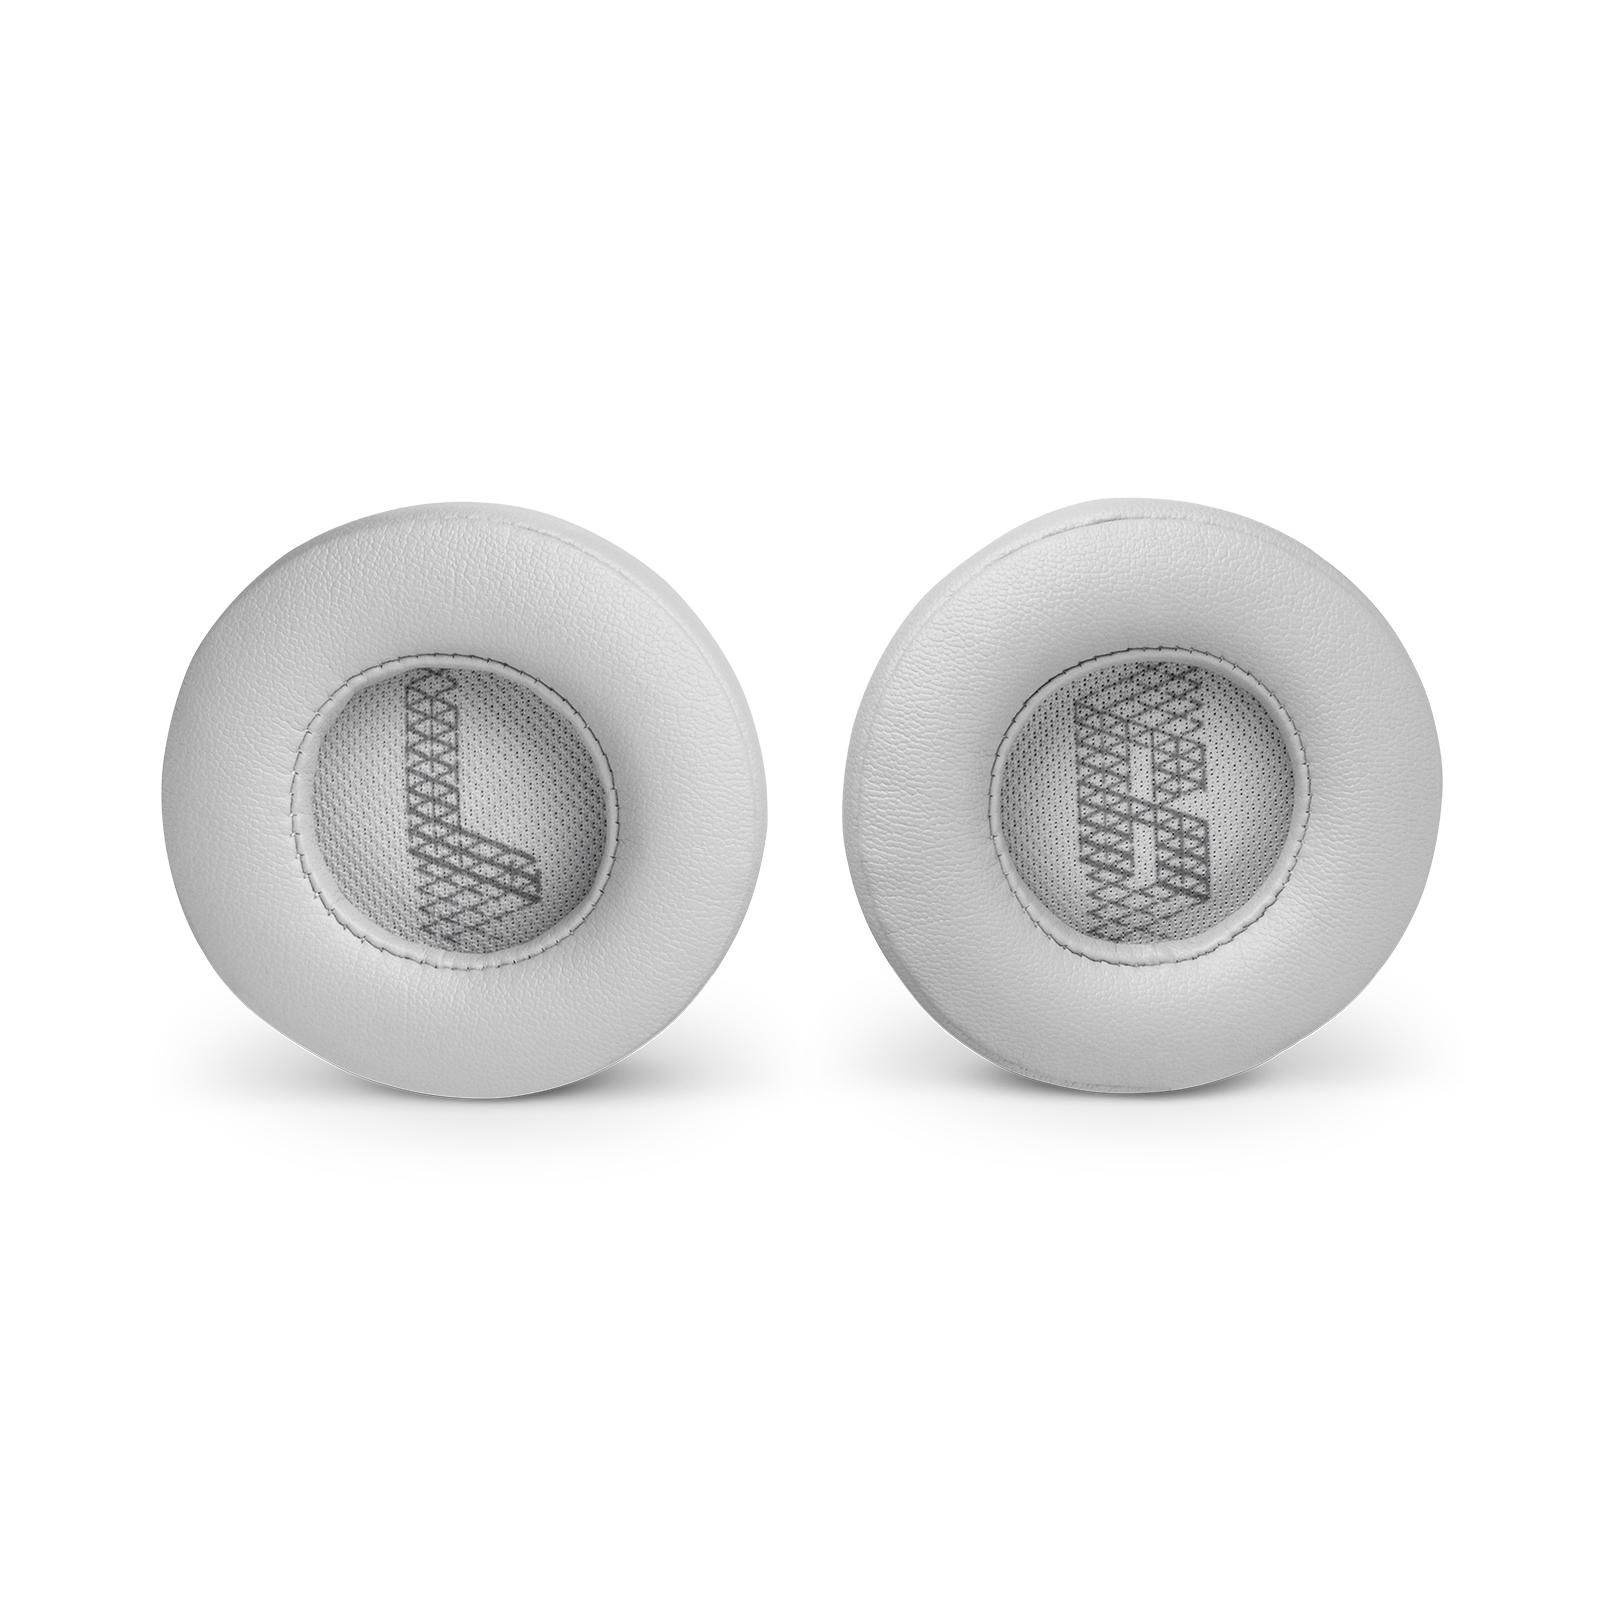 JBL Ear pads for Live 400